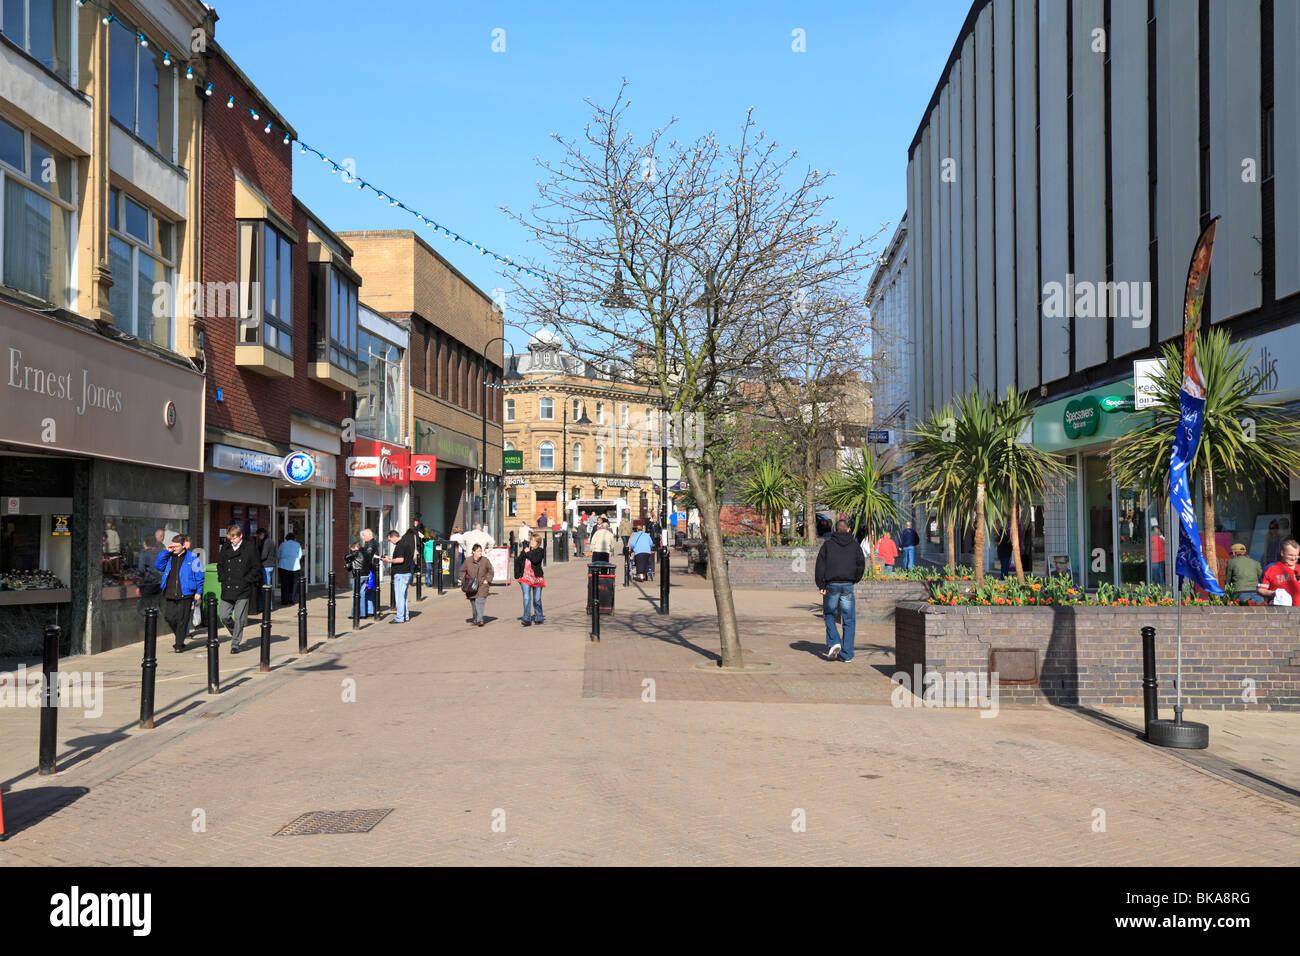 Queens Street shopping precinct, Barnsley, South Yorkshire, England, UK. - Stock Image